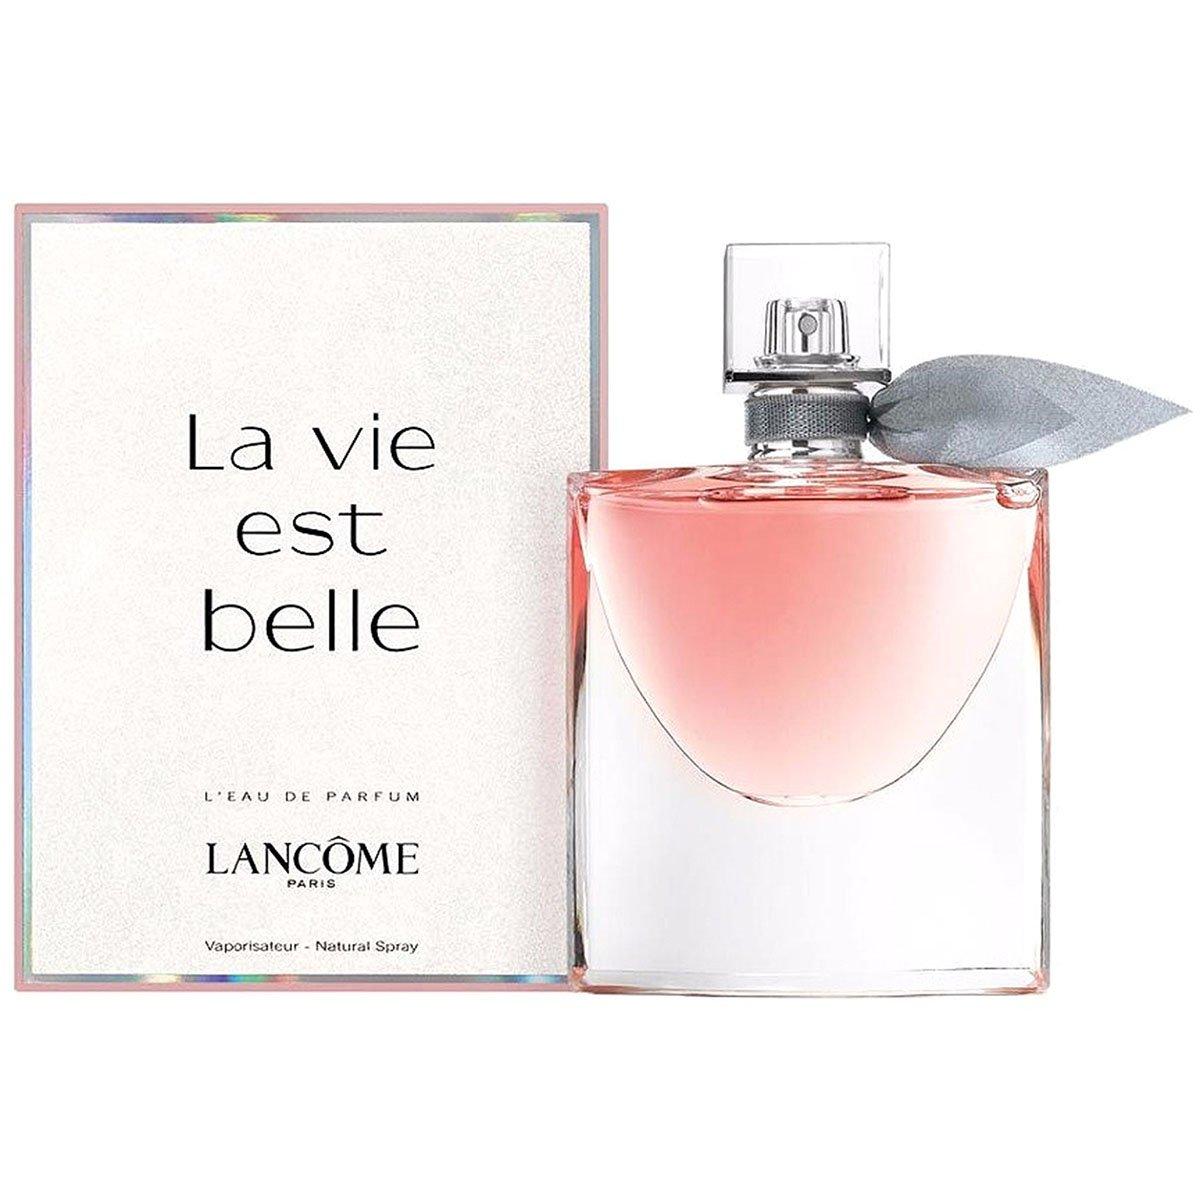 lanc me perfume feminino la vie est belle edp 100ml. Black Bedroom Furniture Sets. Home Design Ideas